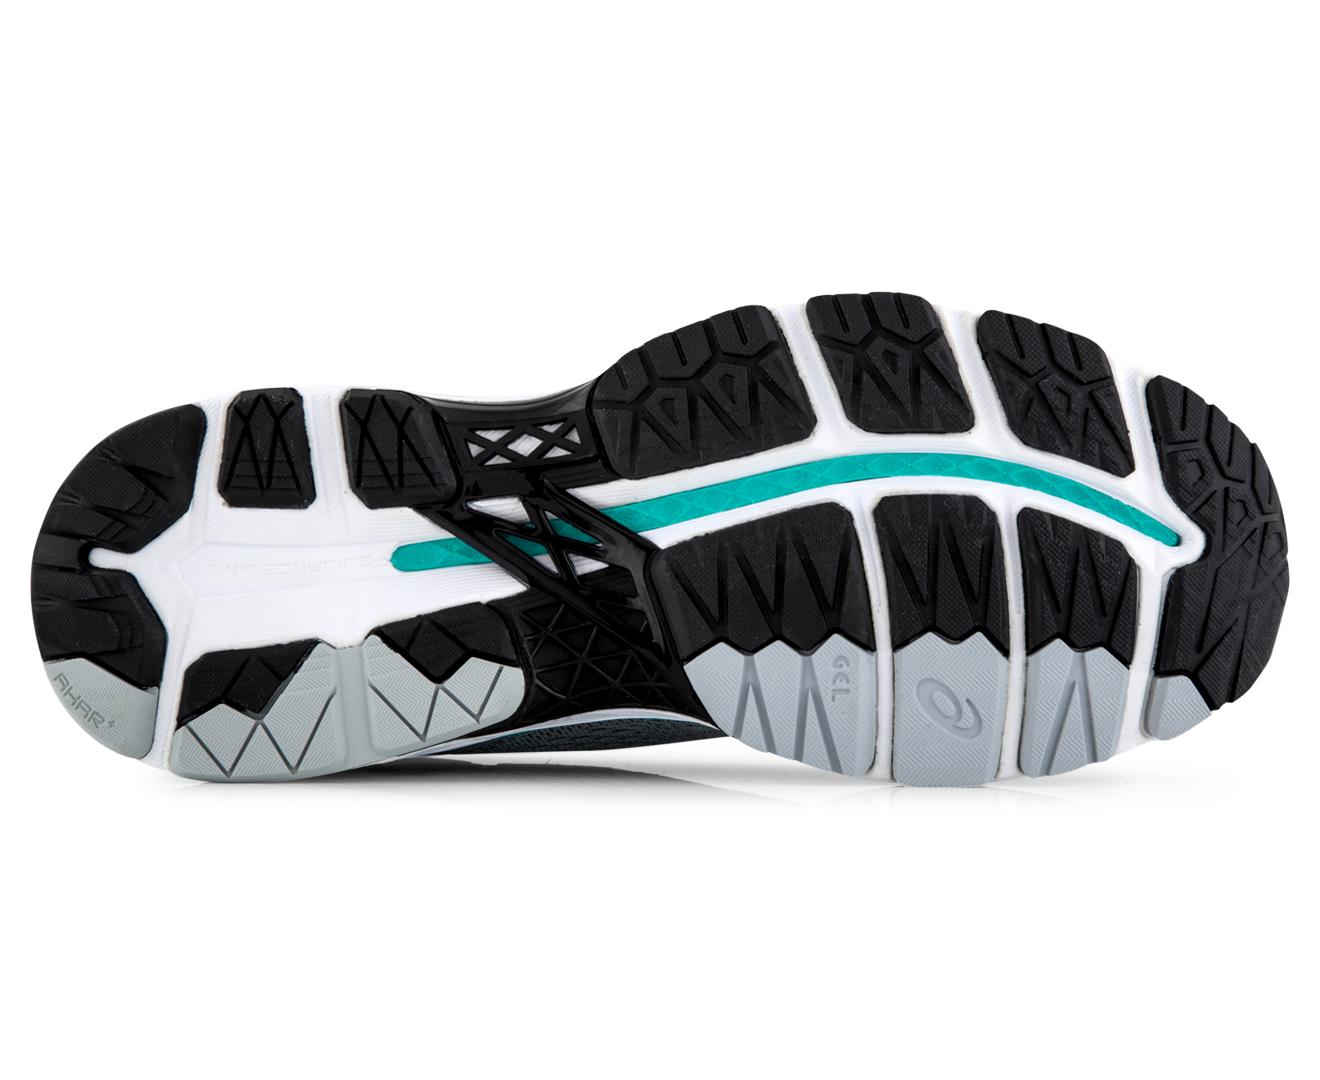 a69f80f29063 ASICS Women s GEL-Kayano 24 Shoe - Mid Grey Black Atlantis